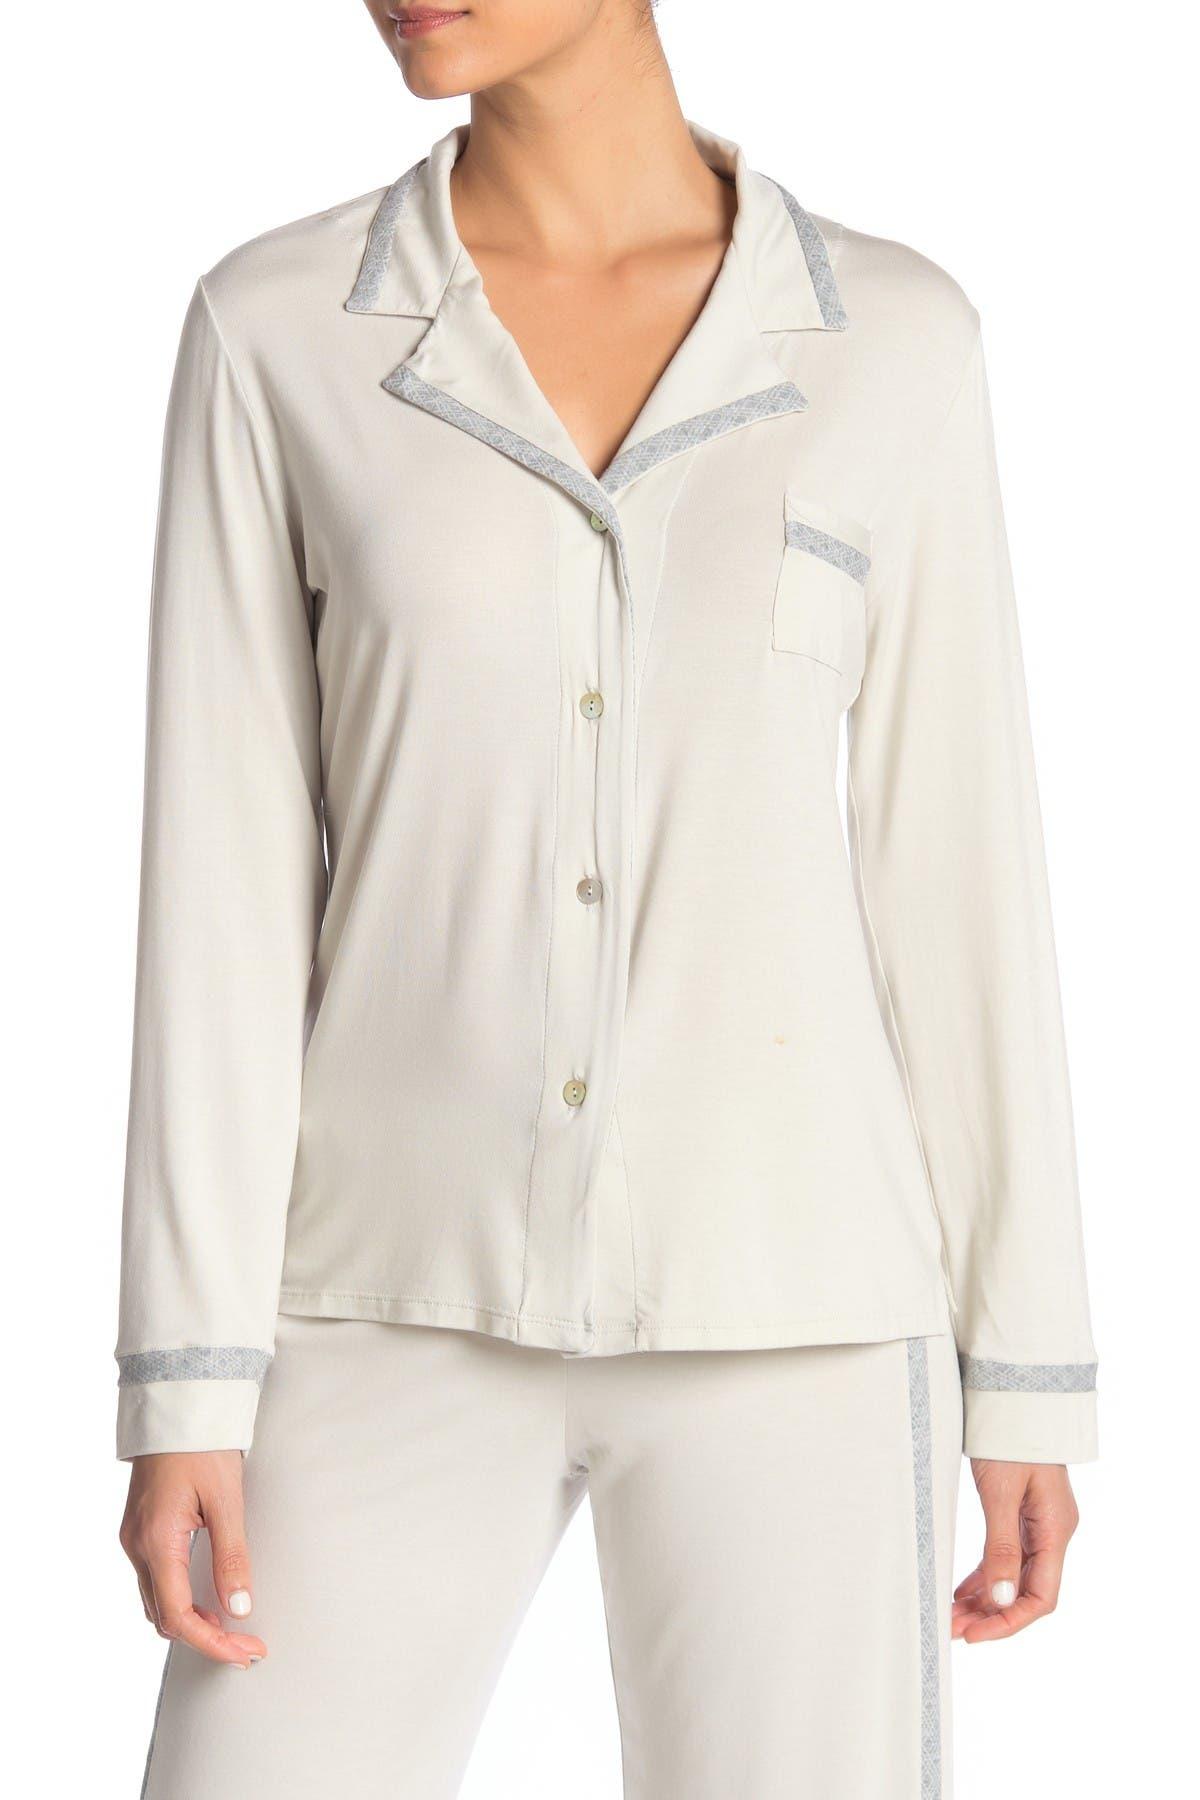 Image of Cosabella Hustle Notch Collar Pajama Top